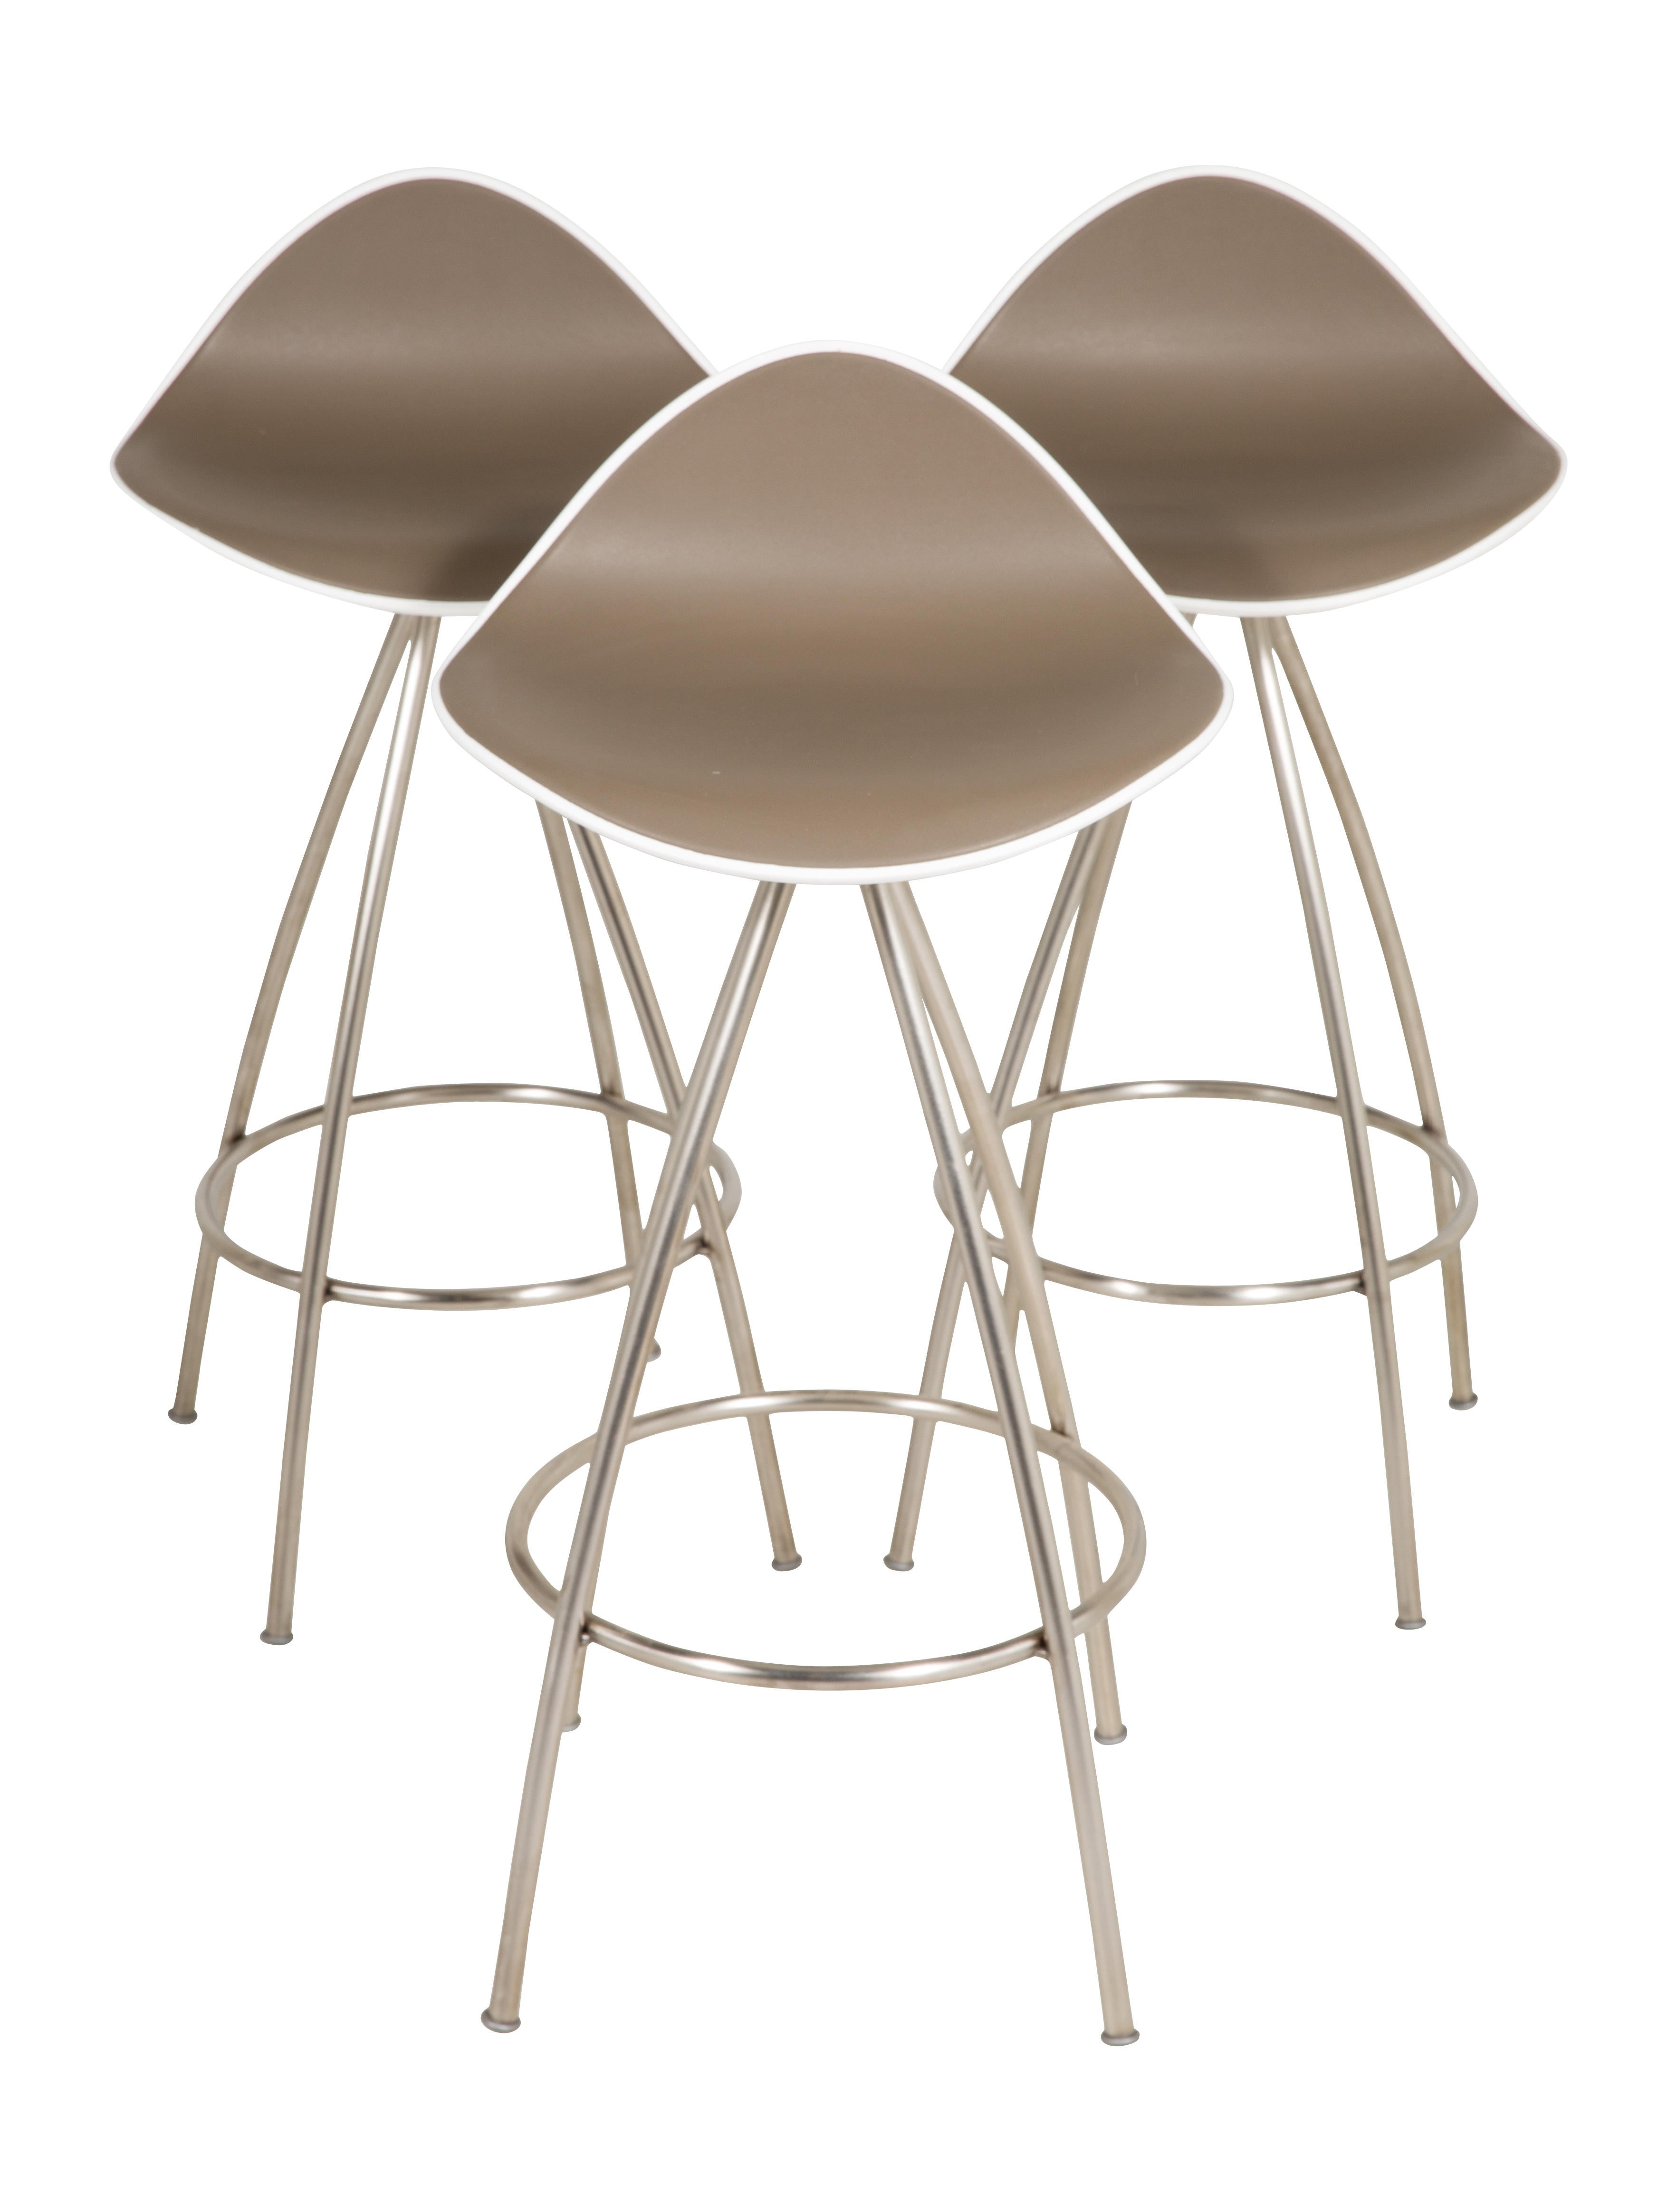 Stua set of three onda counter stools furniture stuaa20007 the realreal - Onda counter stool ...